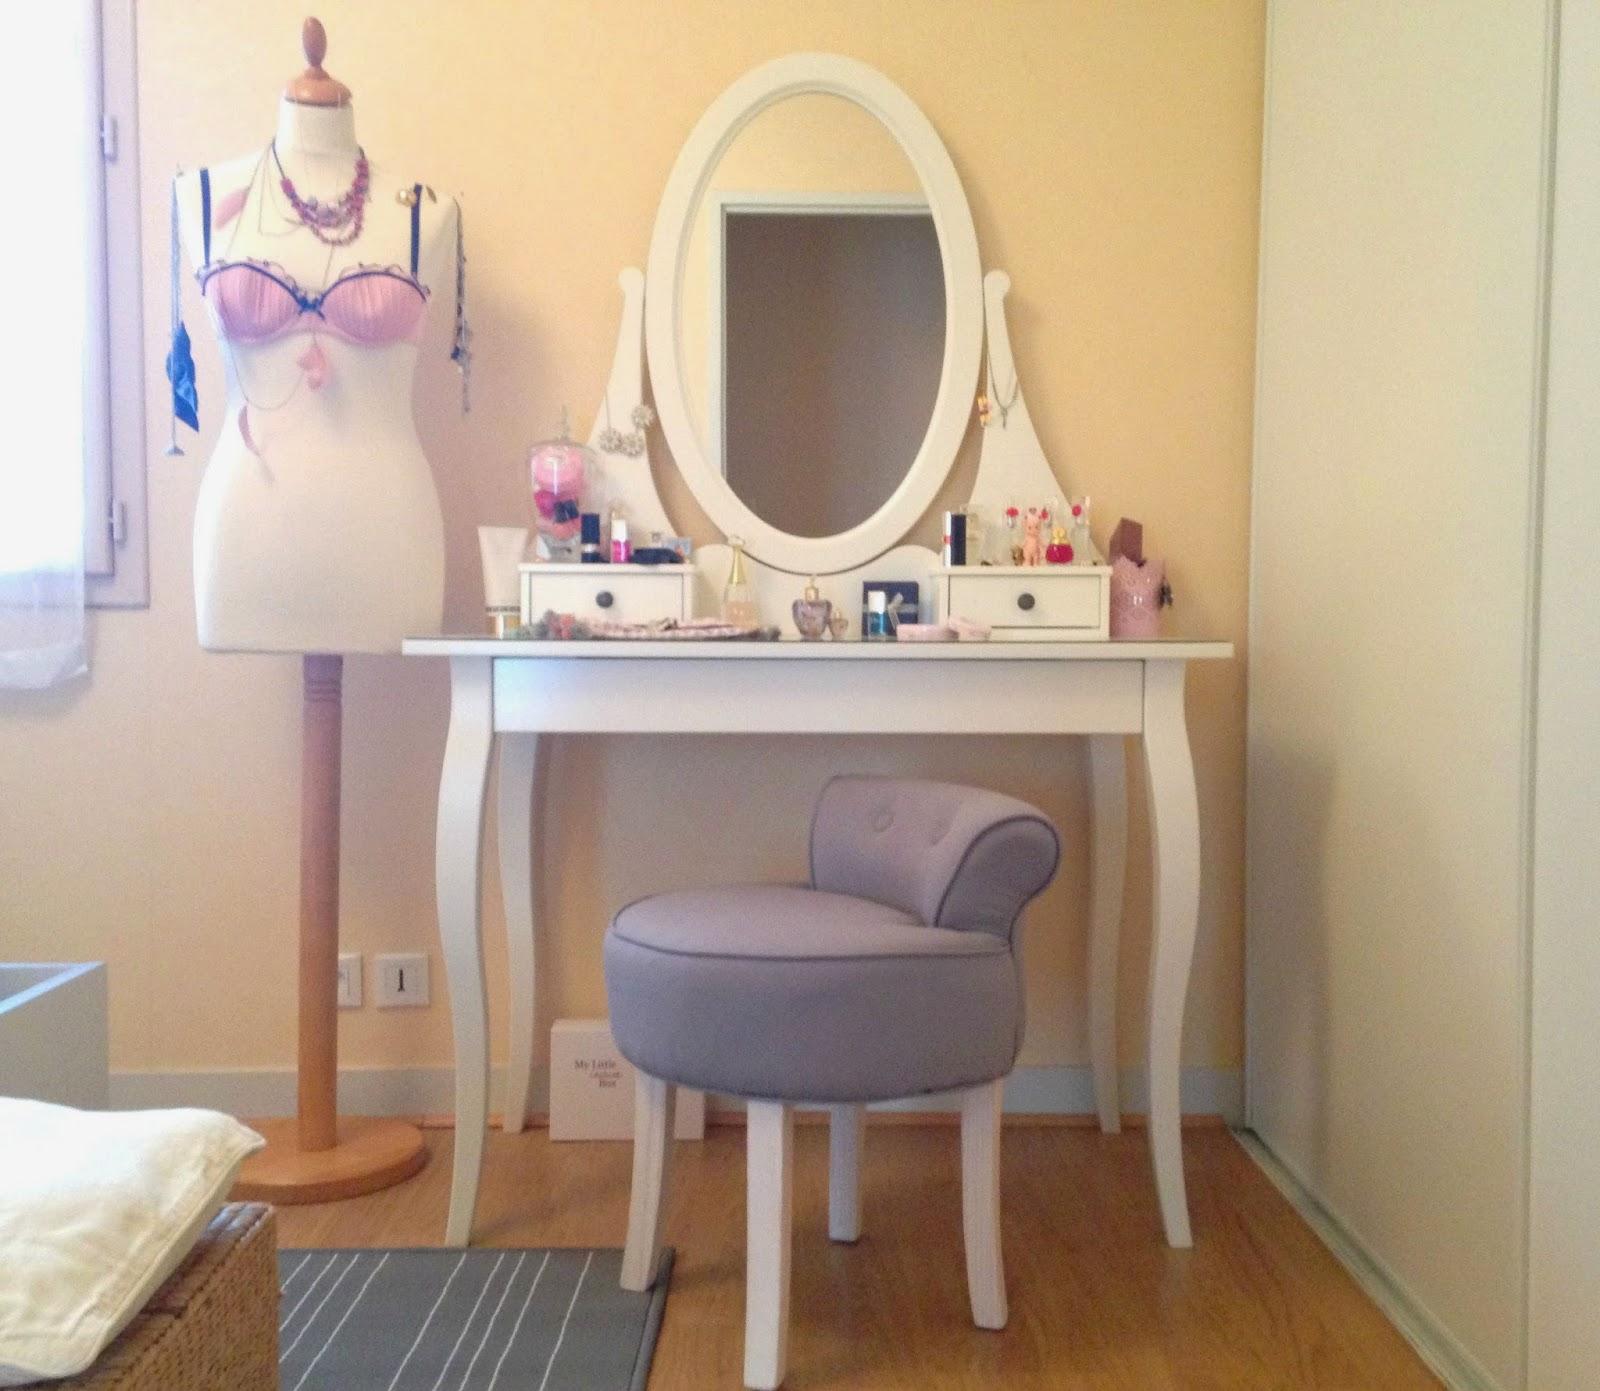 janvier 2015 woody beauty. Black Bedroom Furniture Sets. Home Design Ideas